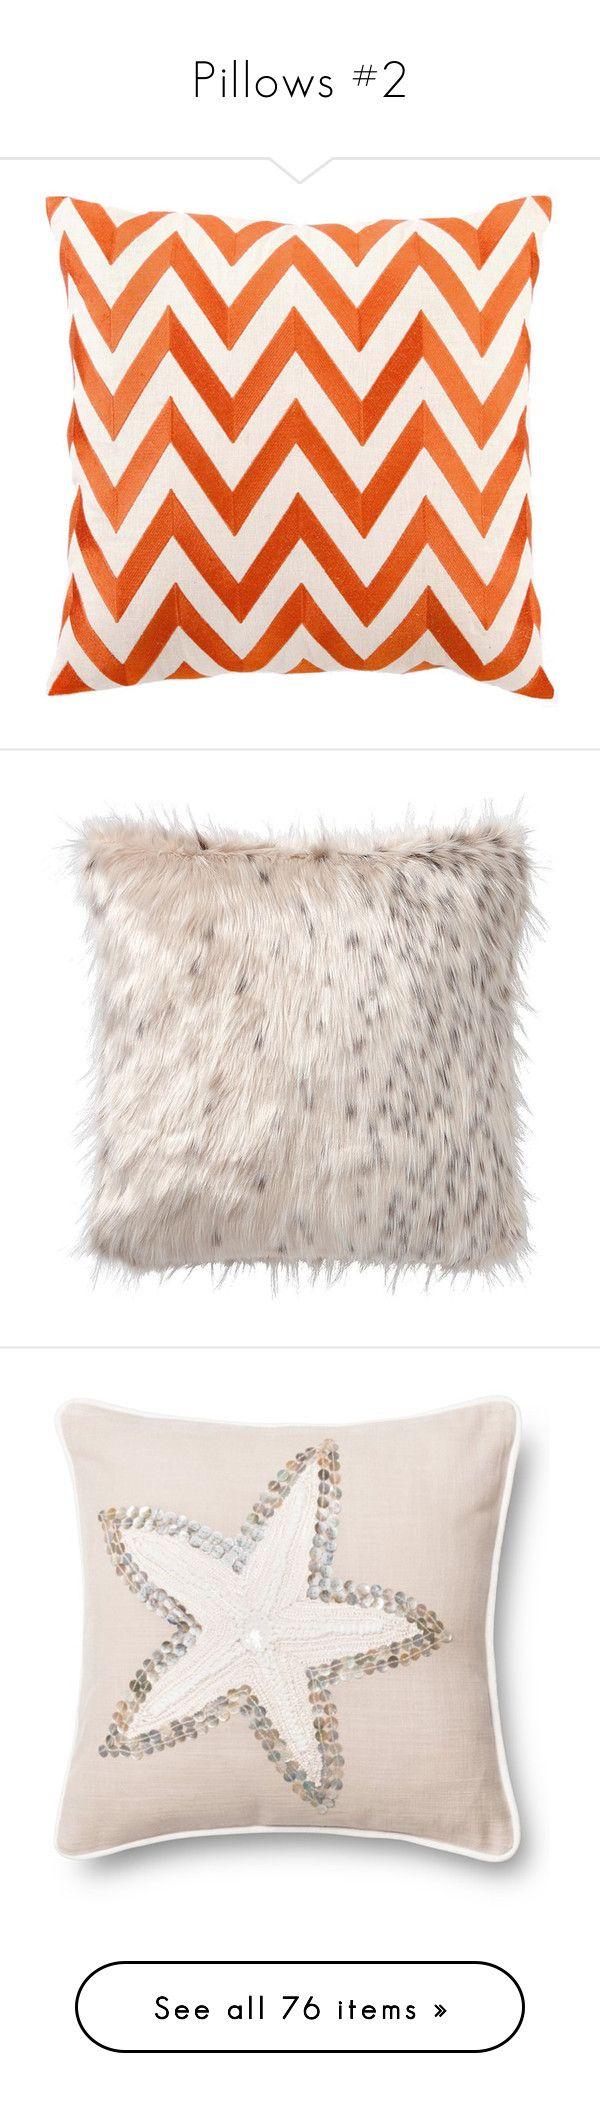 Shop home decor chevron stripes pillow from shop home decor -  Pillows 2 By Nattiexo Liked On Polyvore Featuring Home Home Decor Throw Pillows Inspirational Throw Pillows Tangerine Throw Pillows Chevron Throw